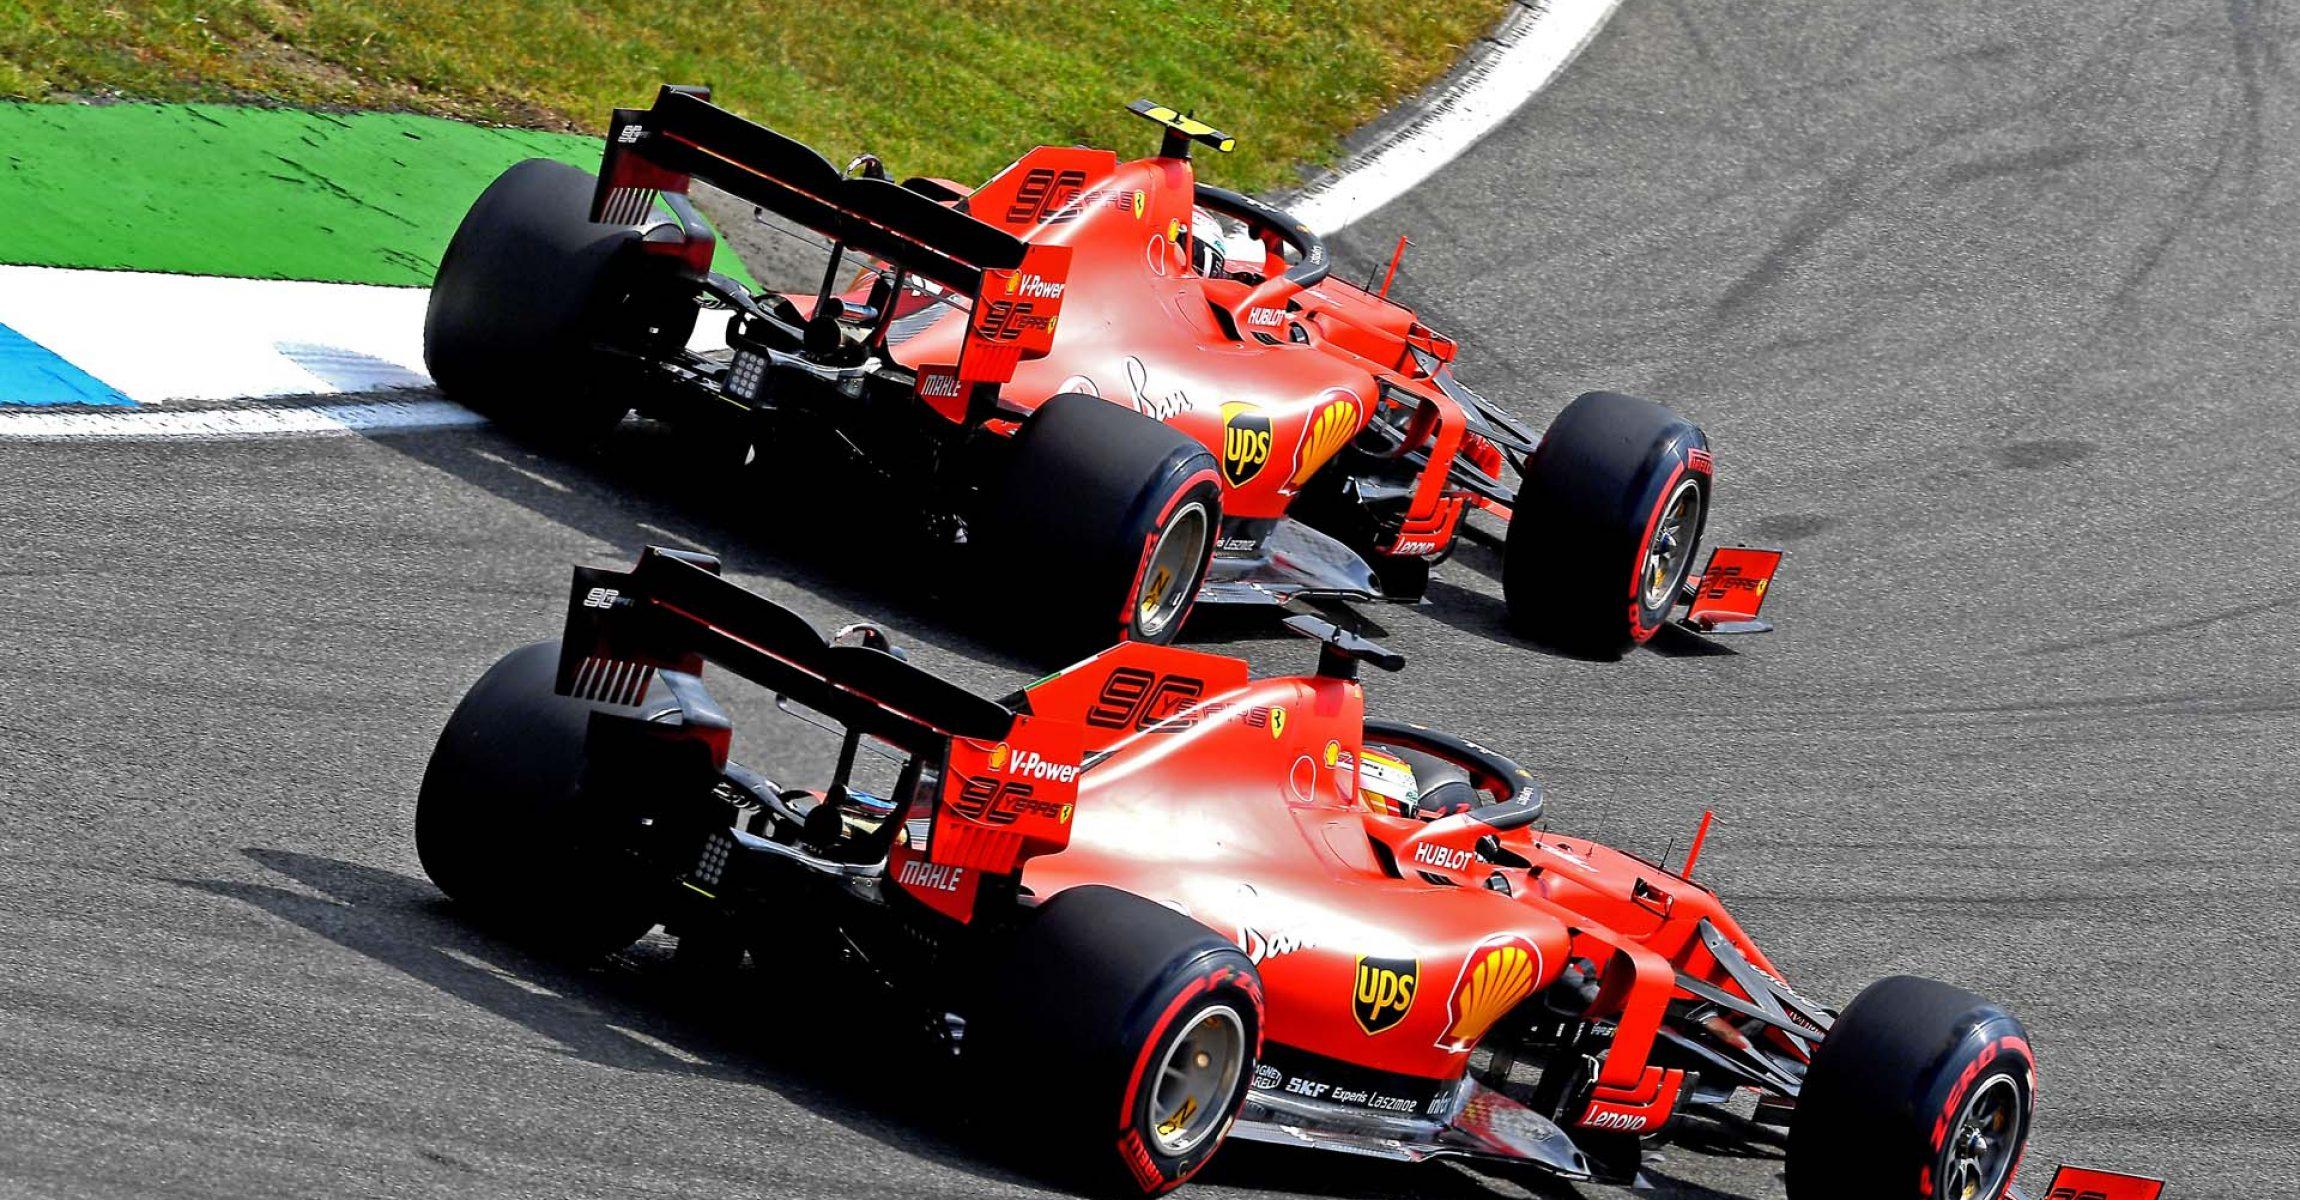 GP GERMANIA F1/2019 - SABATO 27/07/2019  credit: @Scuderia Ferrari Press Office  Charles Leclerc Ferrari Sebastian Vettel